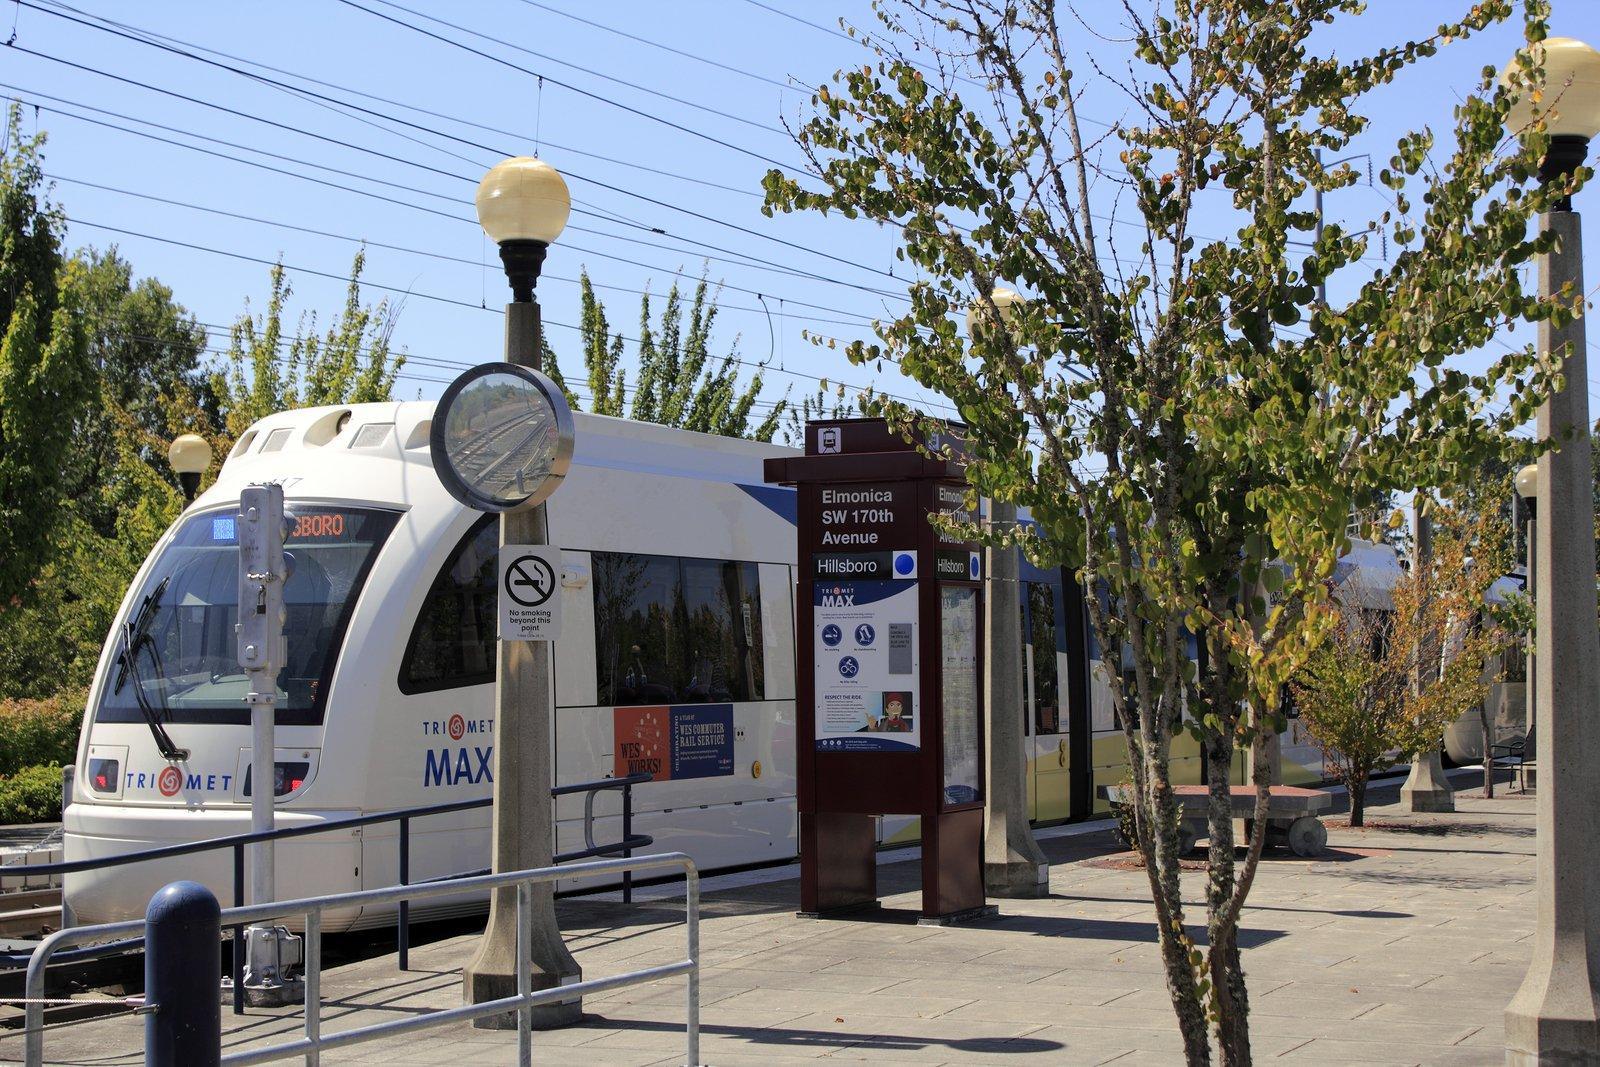 Trimet Commuter Rail in Beaverton Oregon